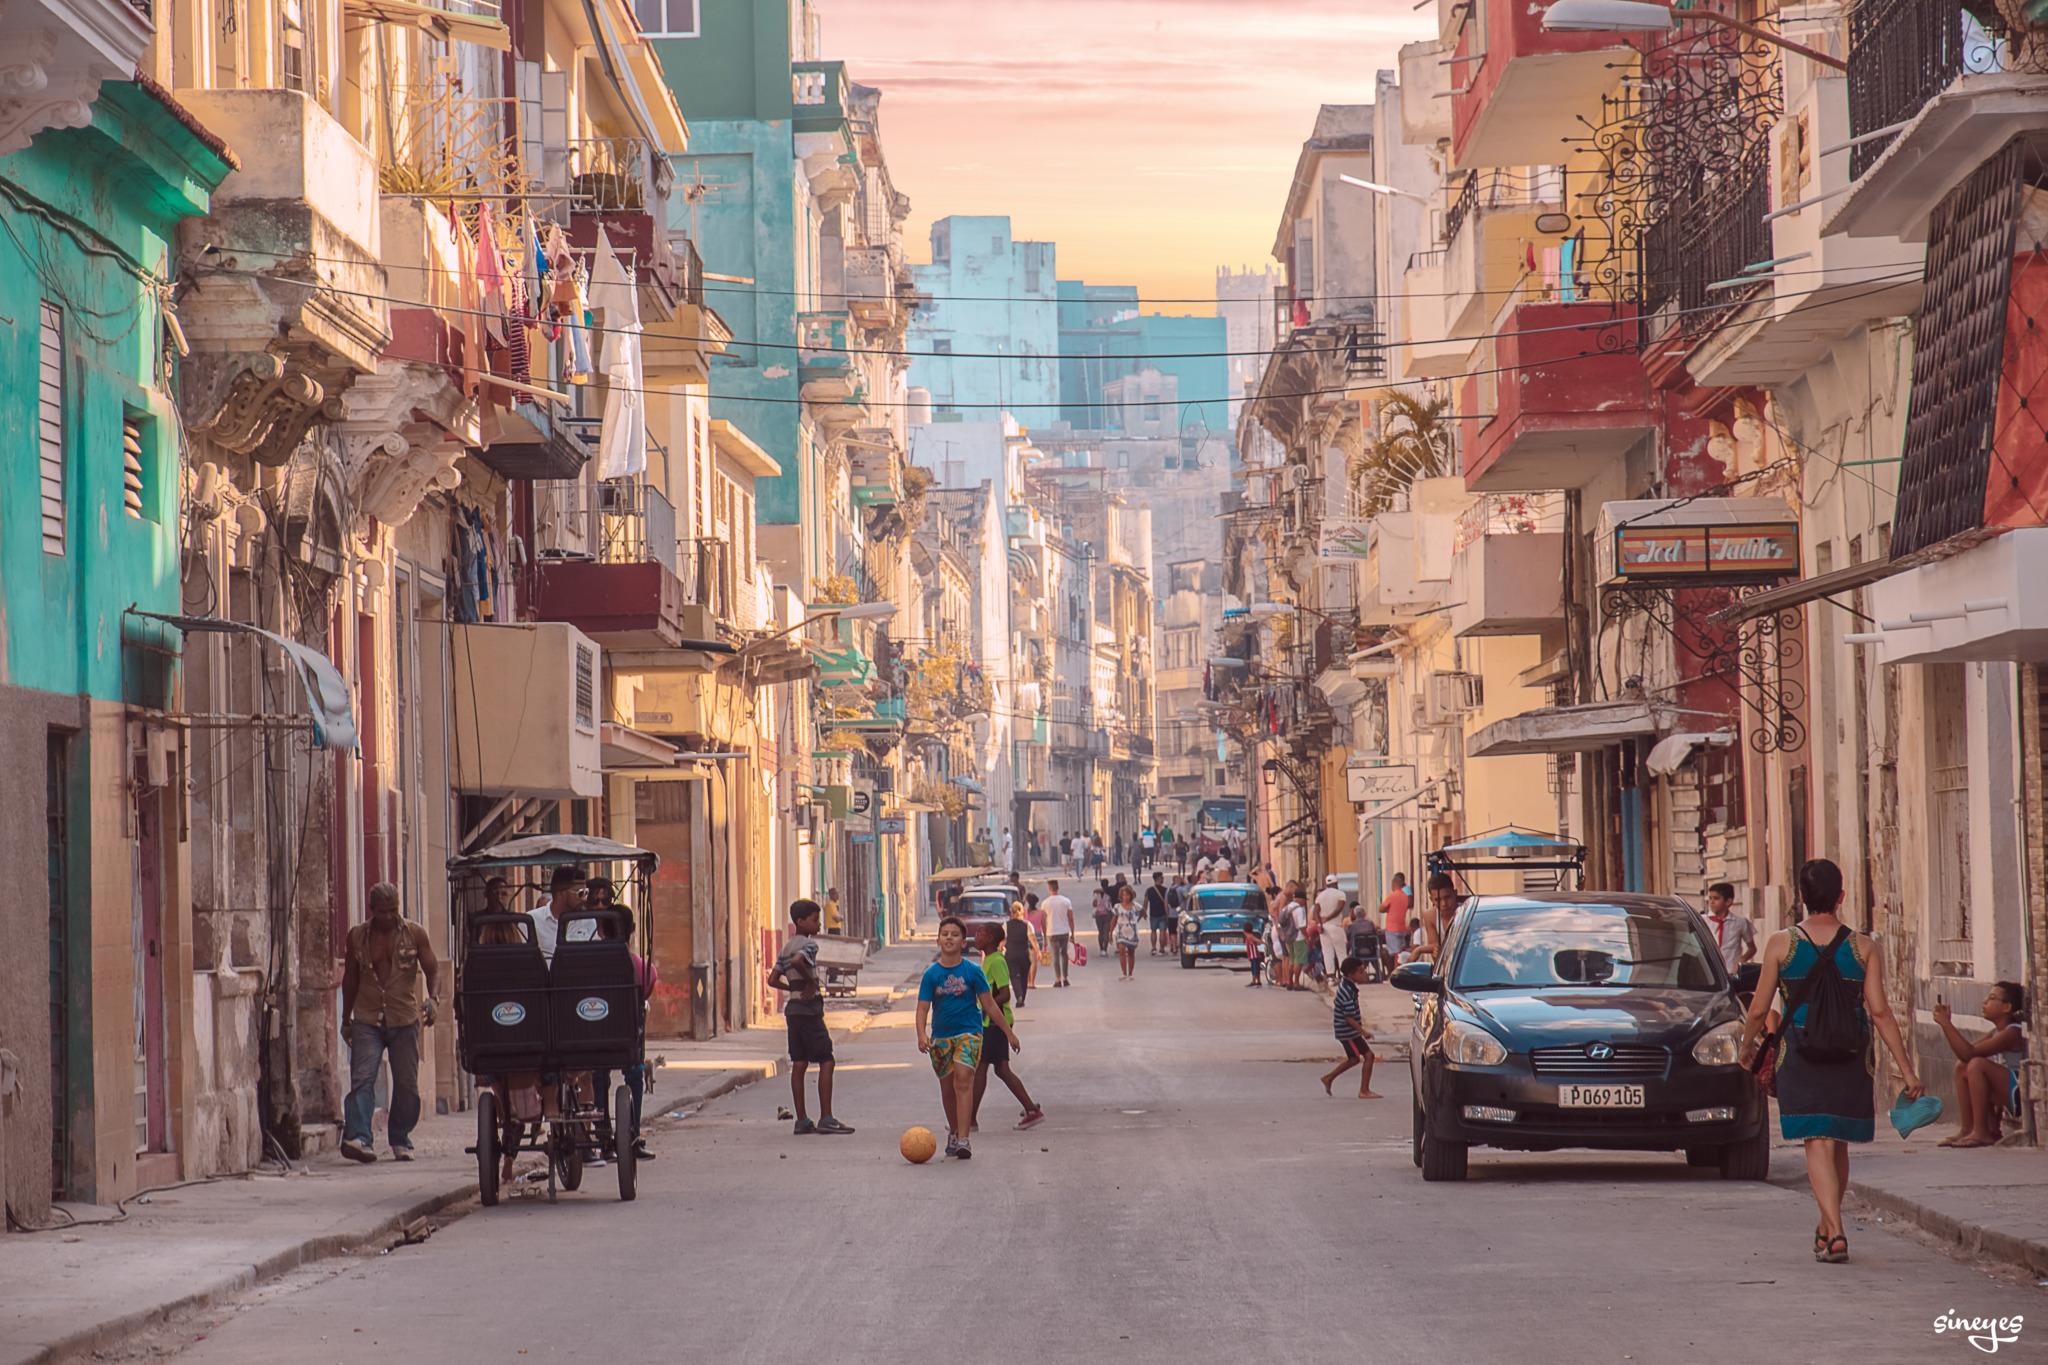 Street Paradise by sineyes